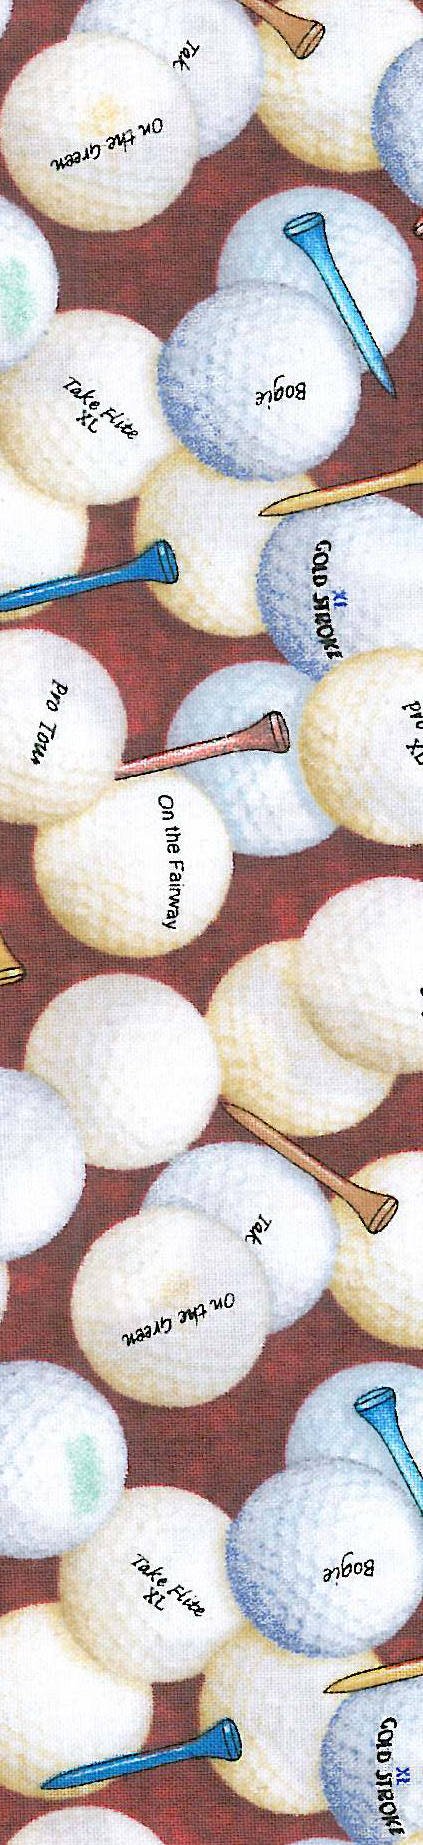 429 Holland Golf